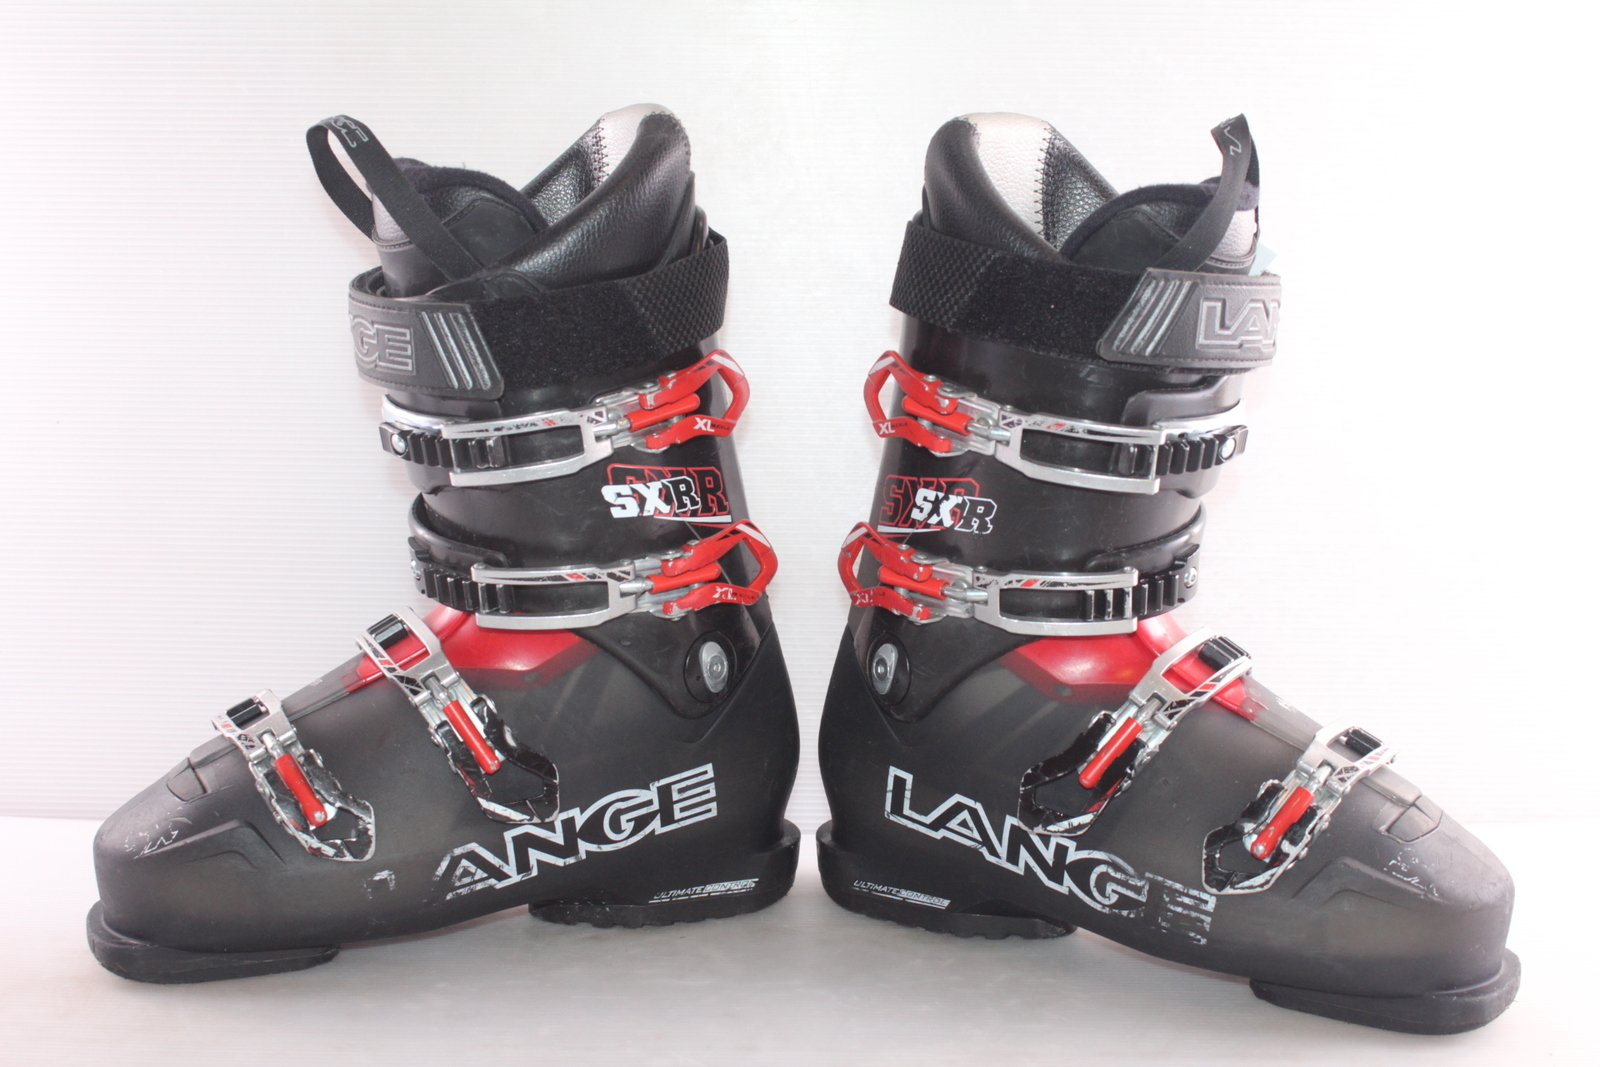 Lyžařské boty Lange SXR vel. EU41 flexe 80